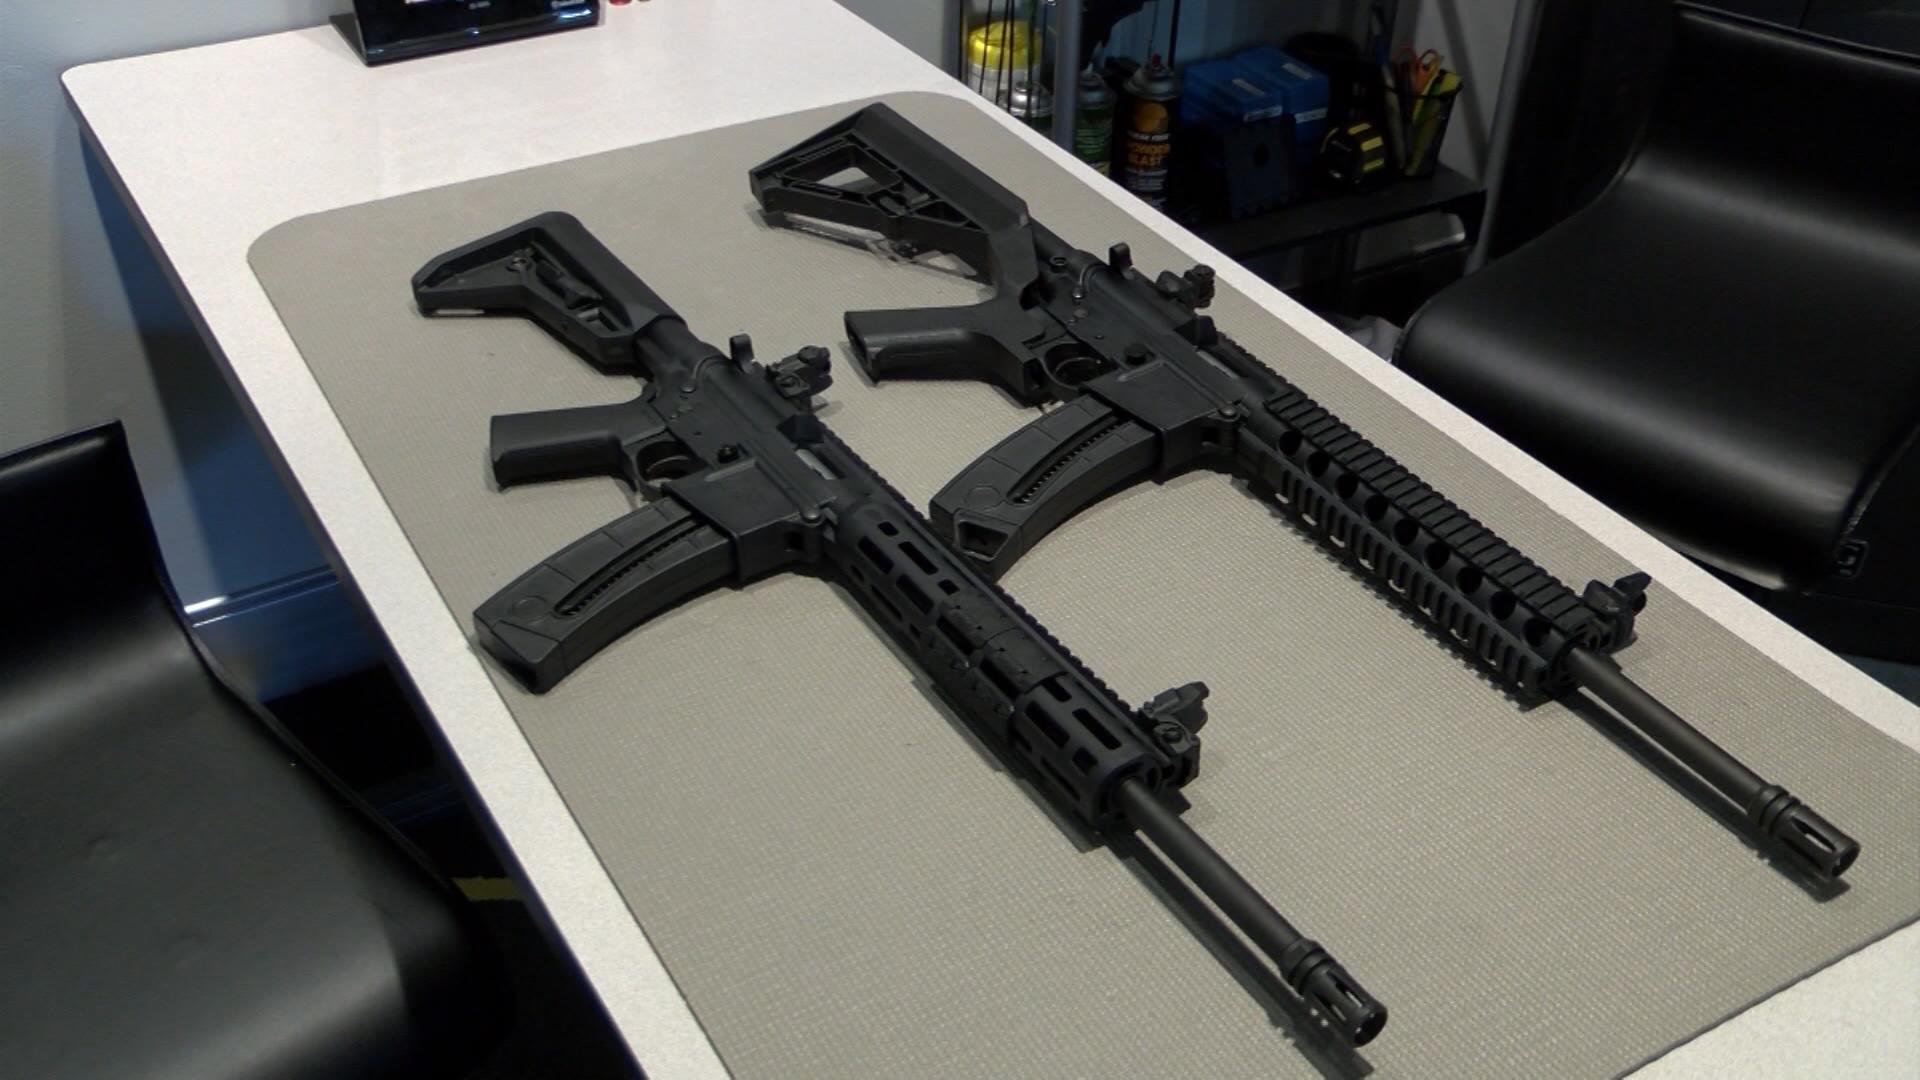 Trump guns_1519252204554.jpg.jpg